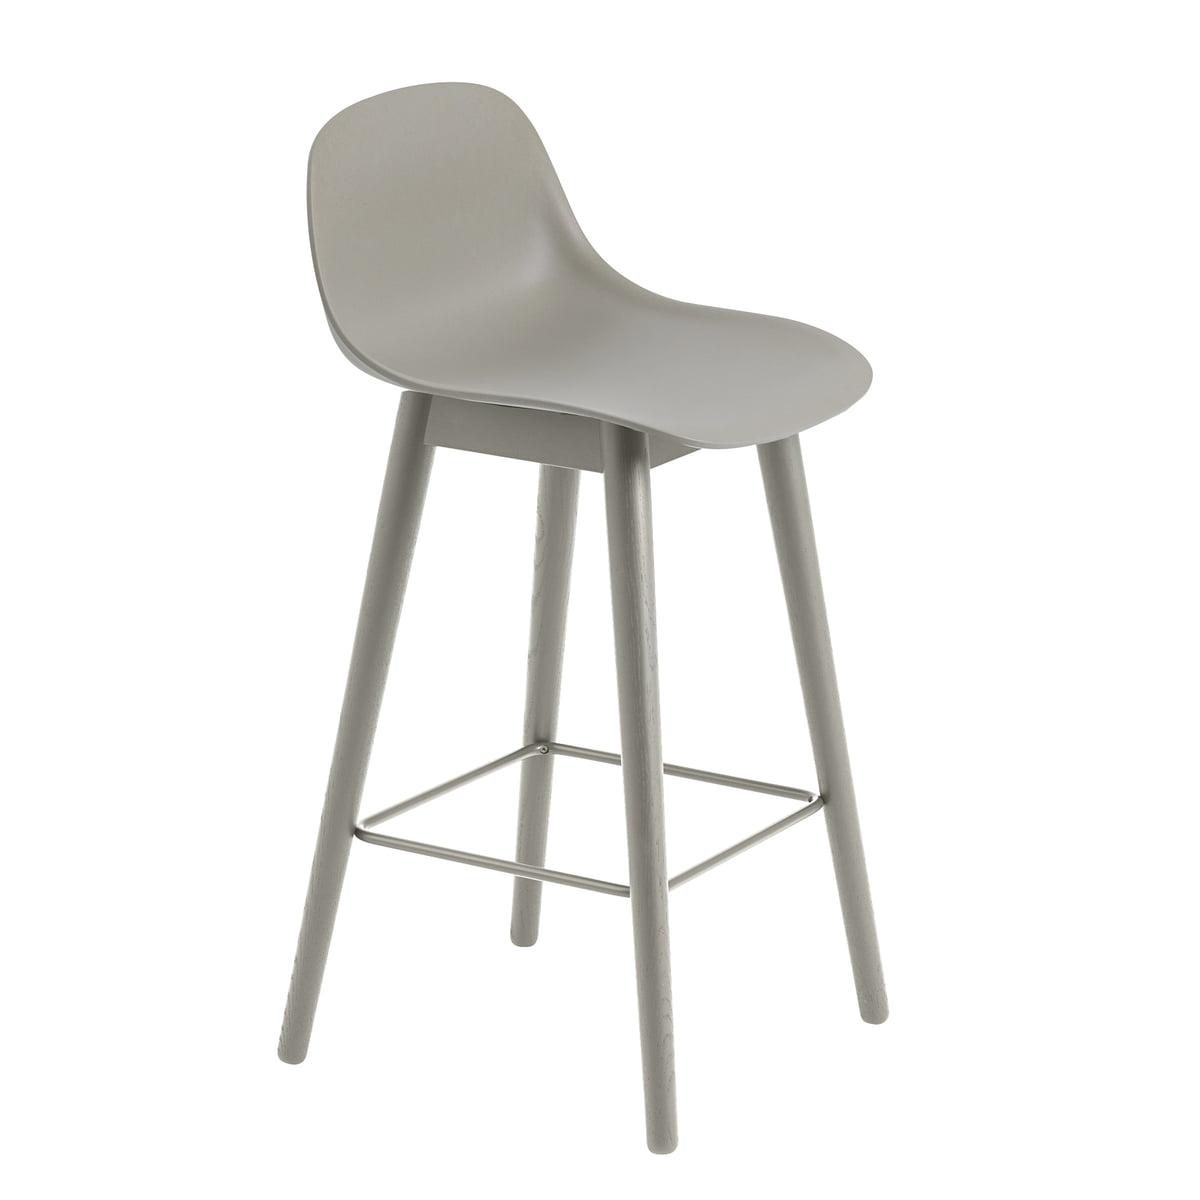 Fiber Bar Stool With Backrest Wood Base By Muuto Connox